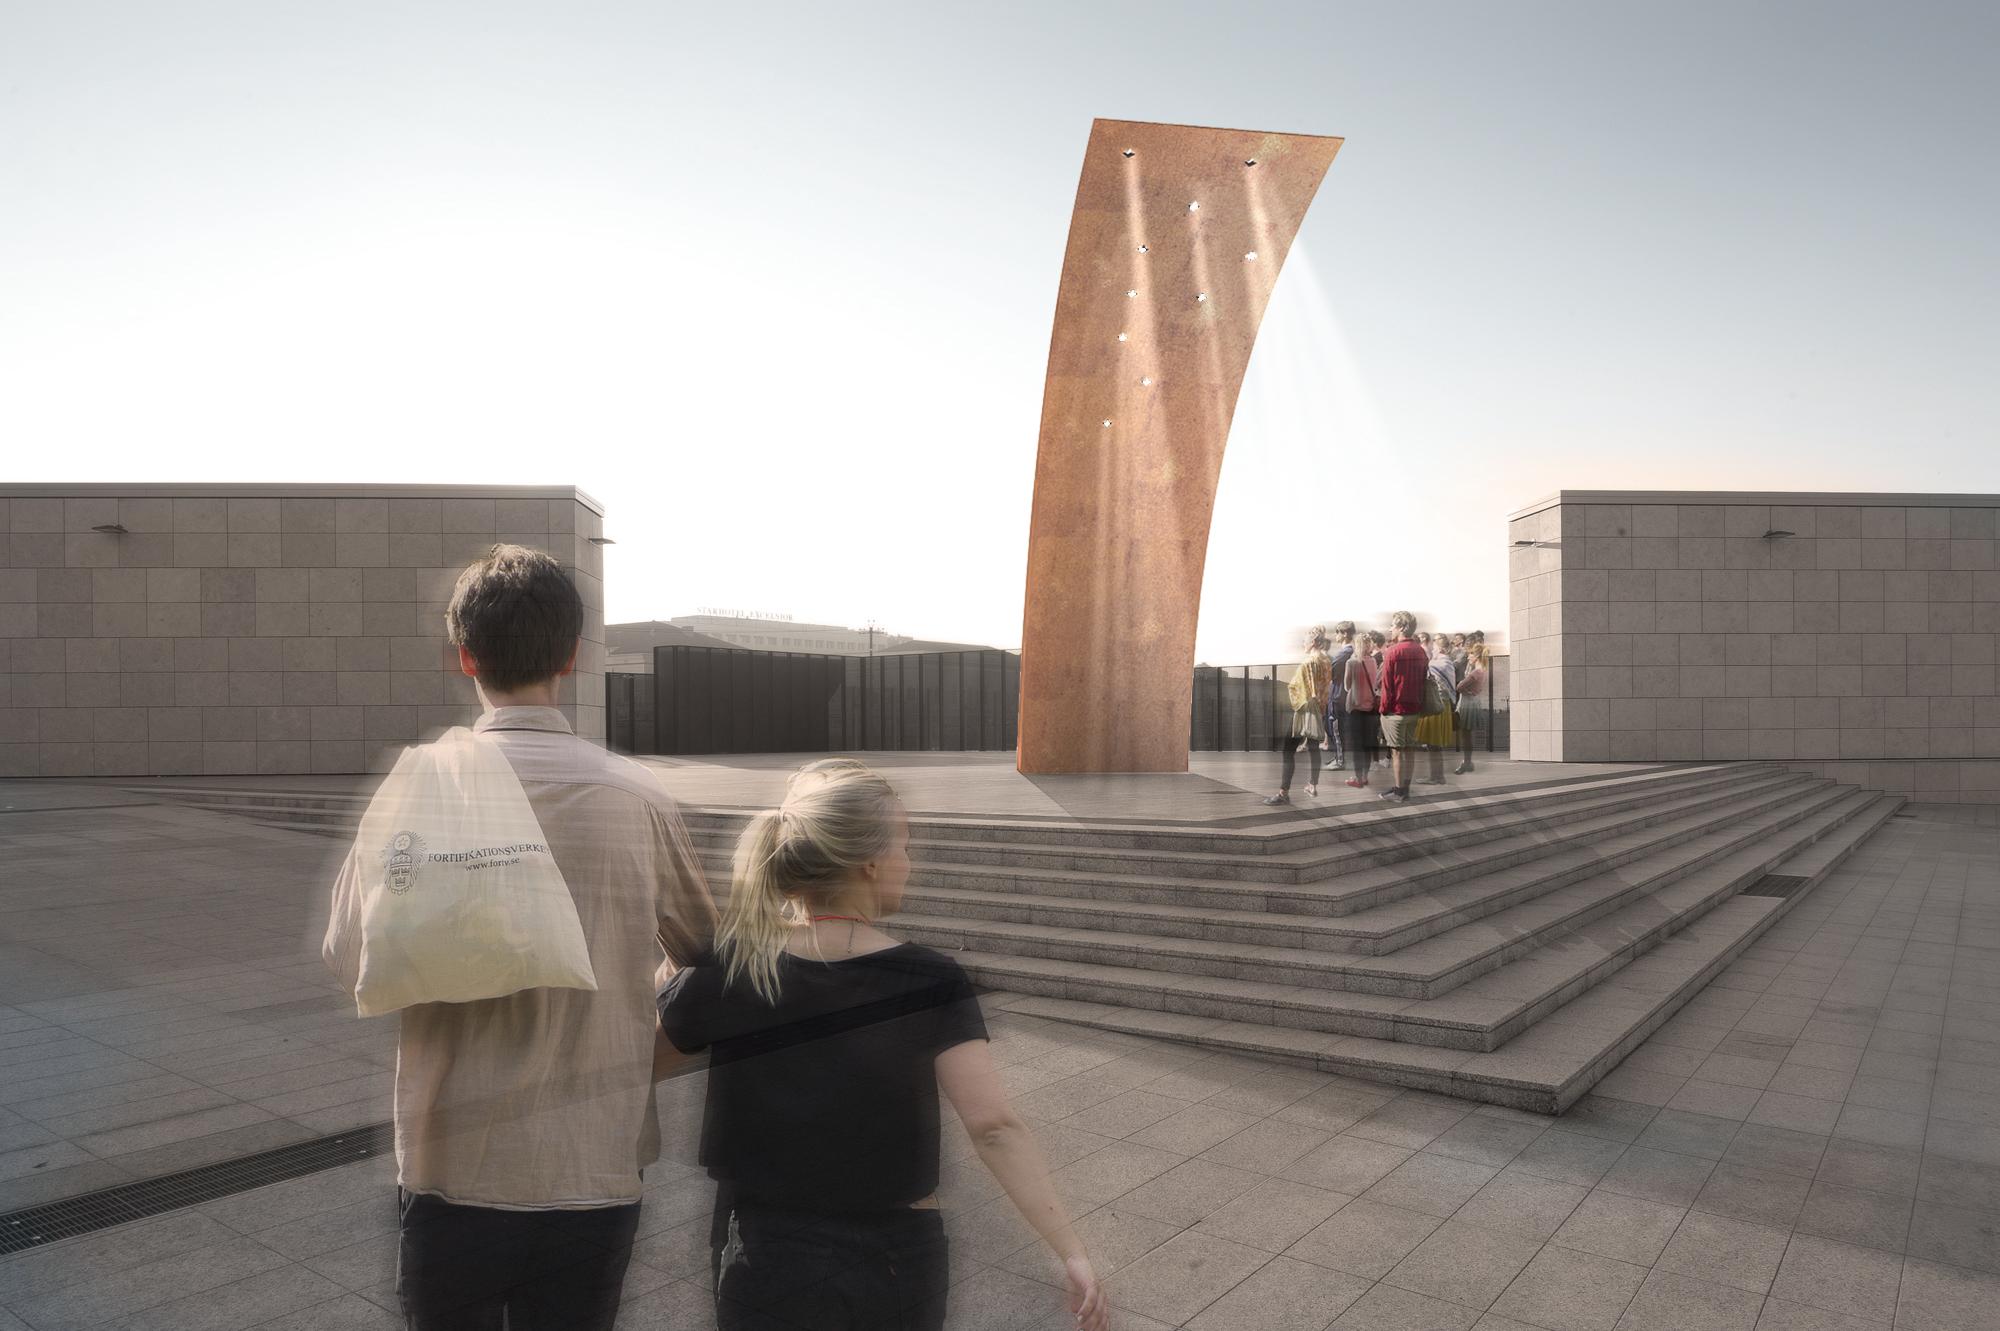 https://nbc-arhitect.ro/wp-content/uploads/2020/10/NBC-Arhitect-_-contests-_-Shoah-Bologna-Memorial-_-Romania_1.jpg